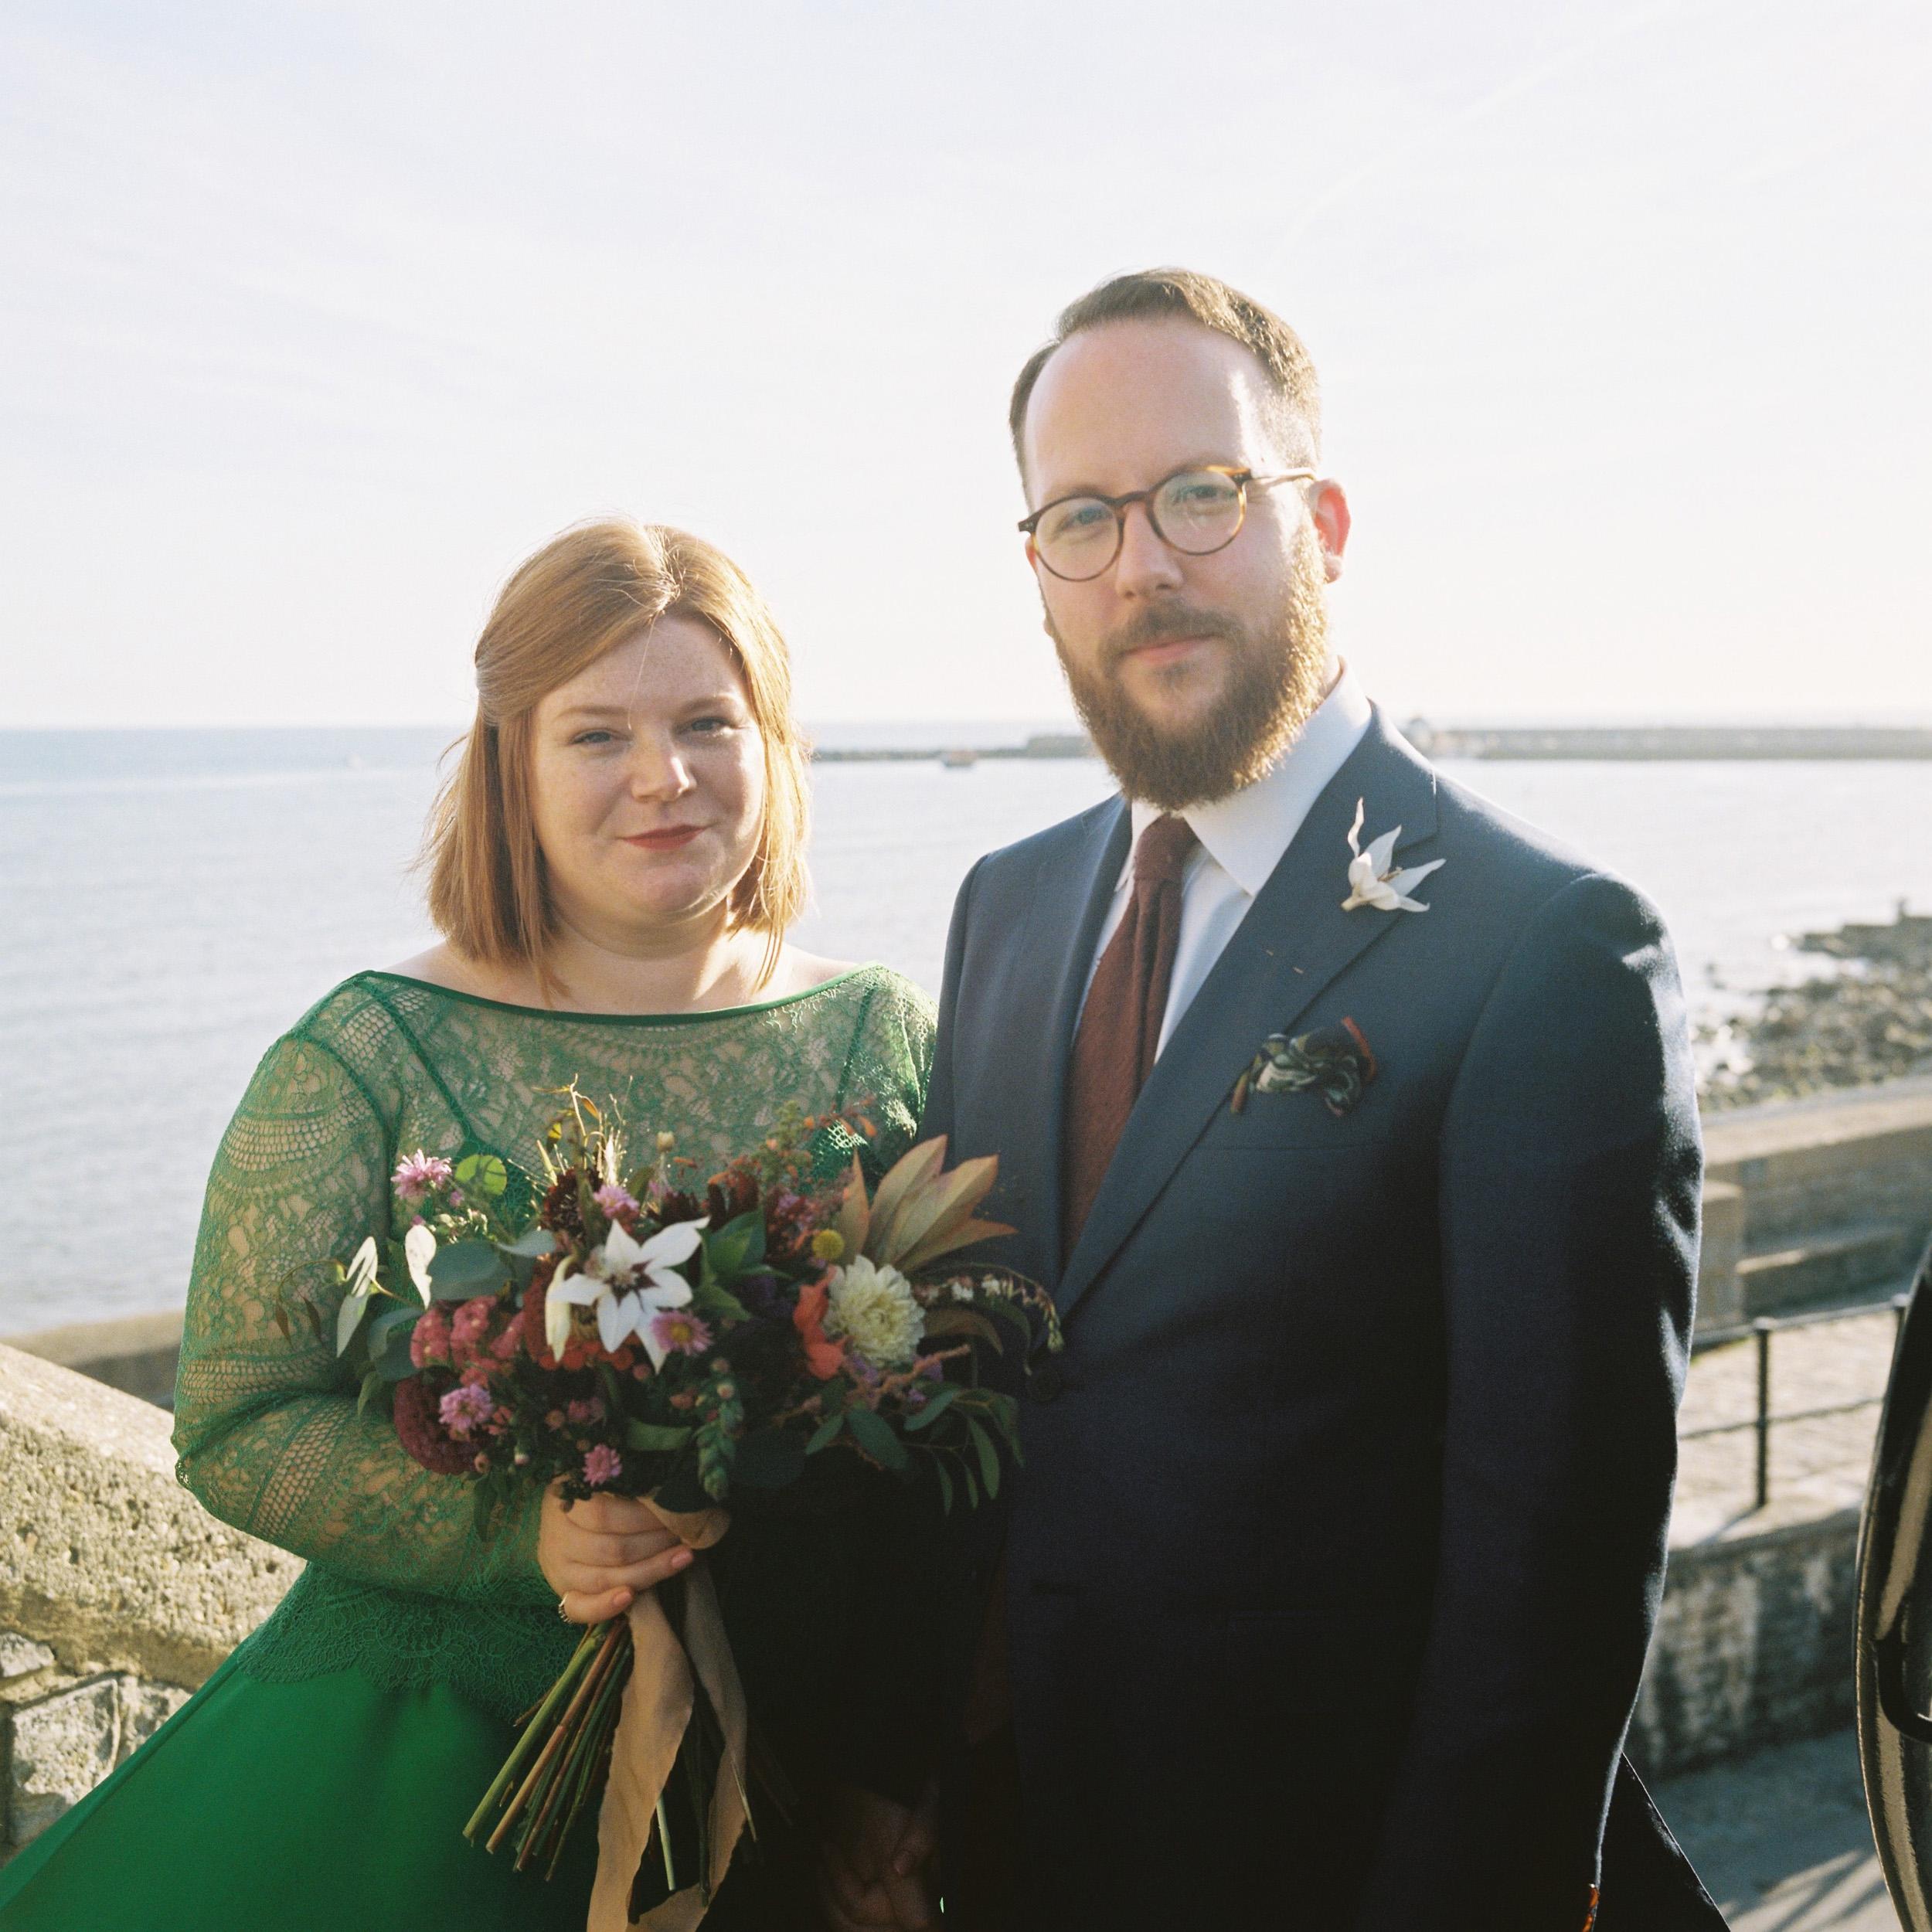 Lucy-Bespoke-Green-Silk-Lace-Wedding-Dress-Kate-Beaumont-Sheffield-1.jpg